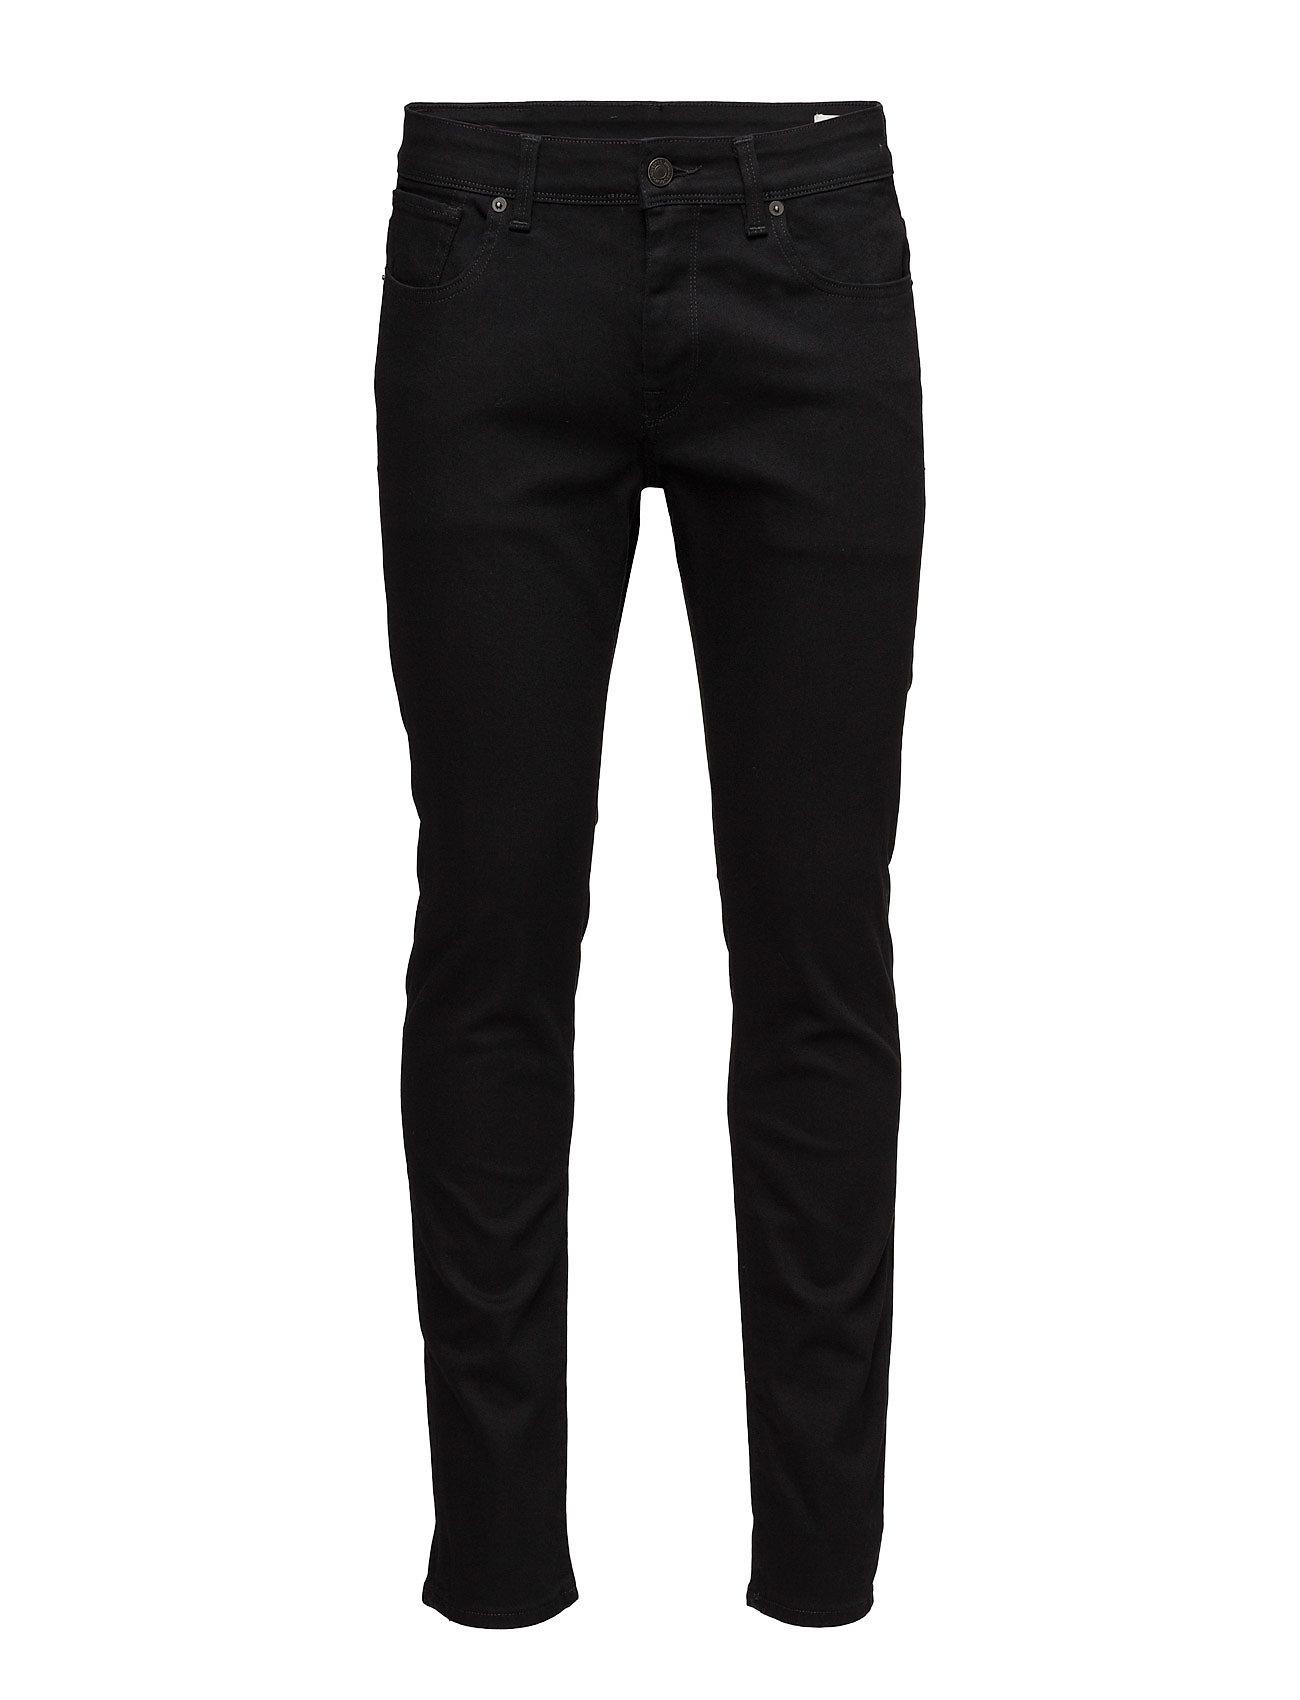 Selected Homme SLHSLIM-LEON 1001 BLACK ST JNS W NOOS - BLACK